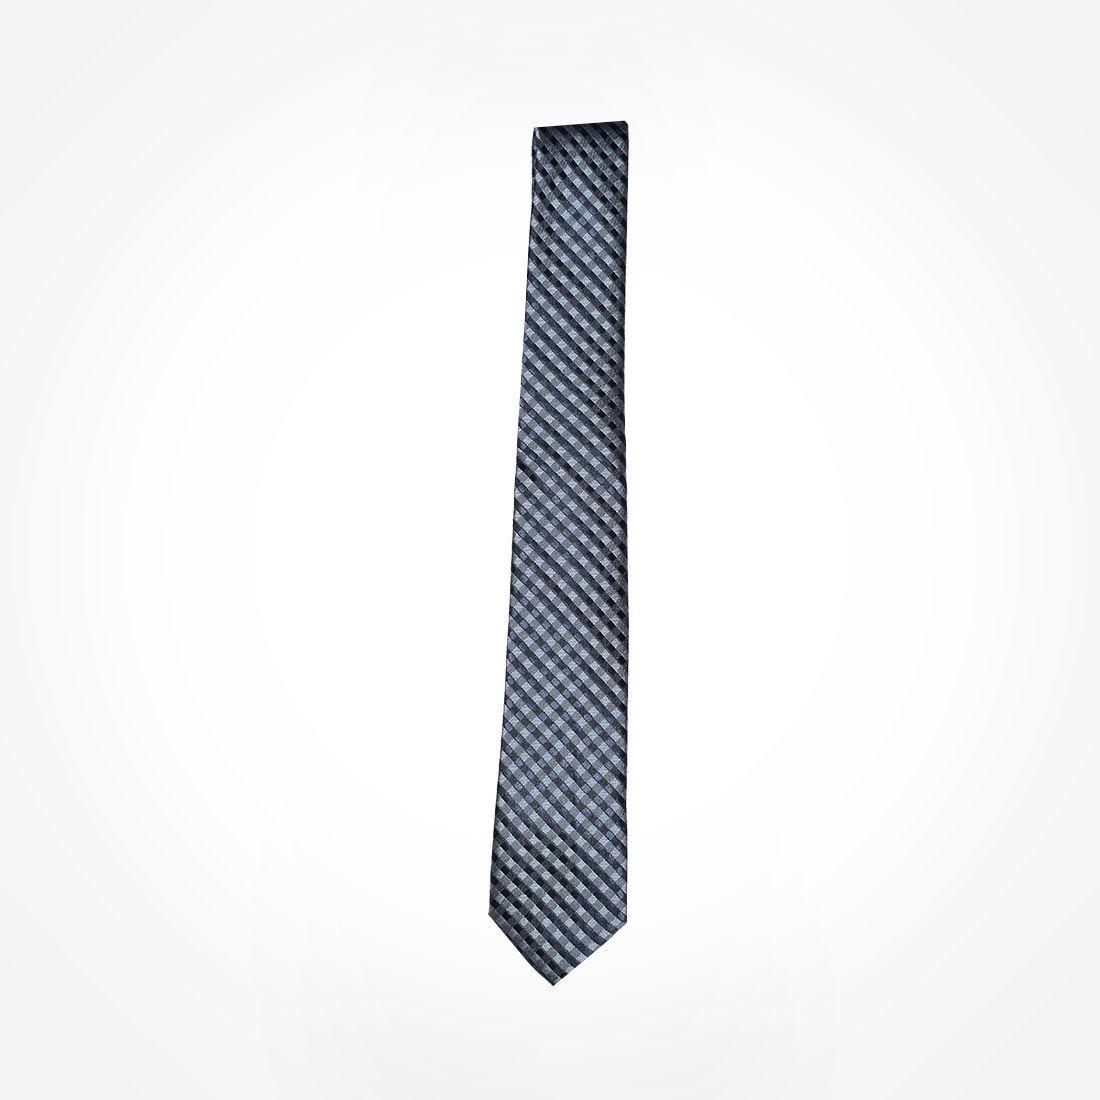 4020 - Gravata Azul Xadrez Slim - LEVOK